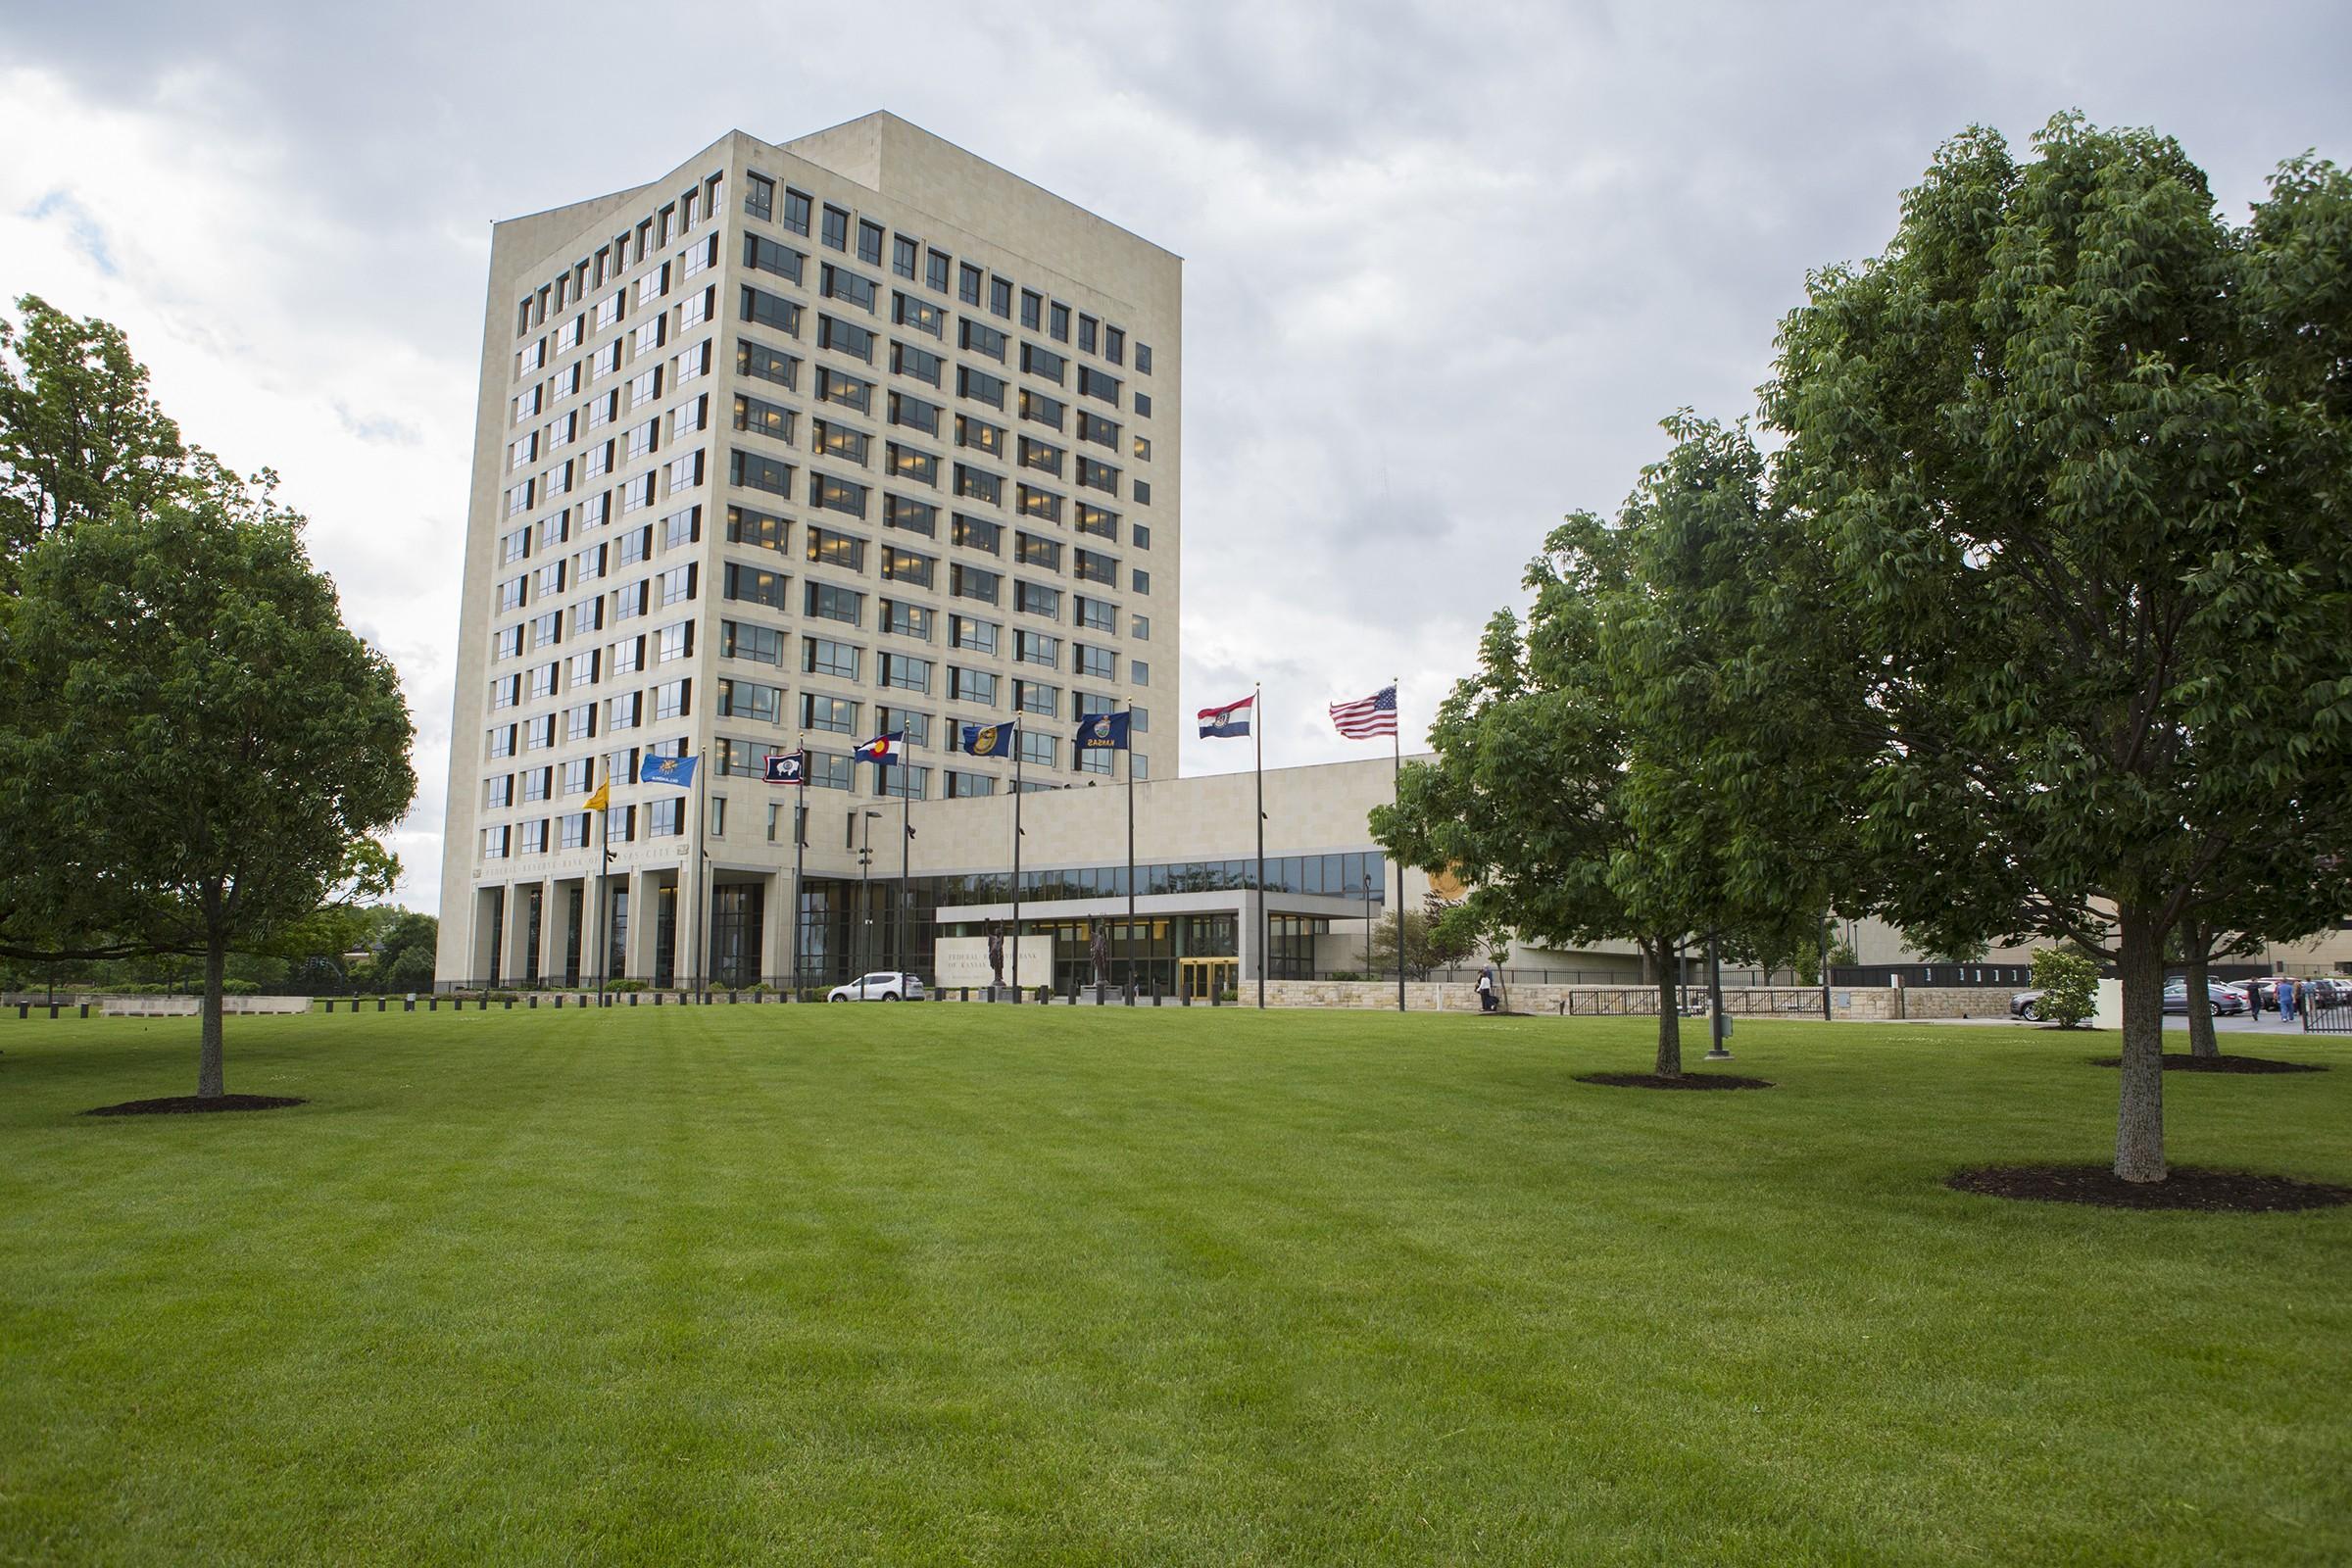 Federal Reserve Bank of Kansas City | LinkedIn